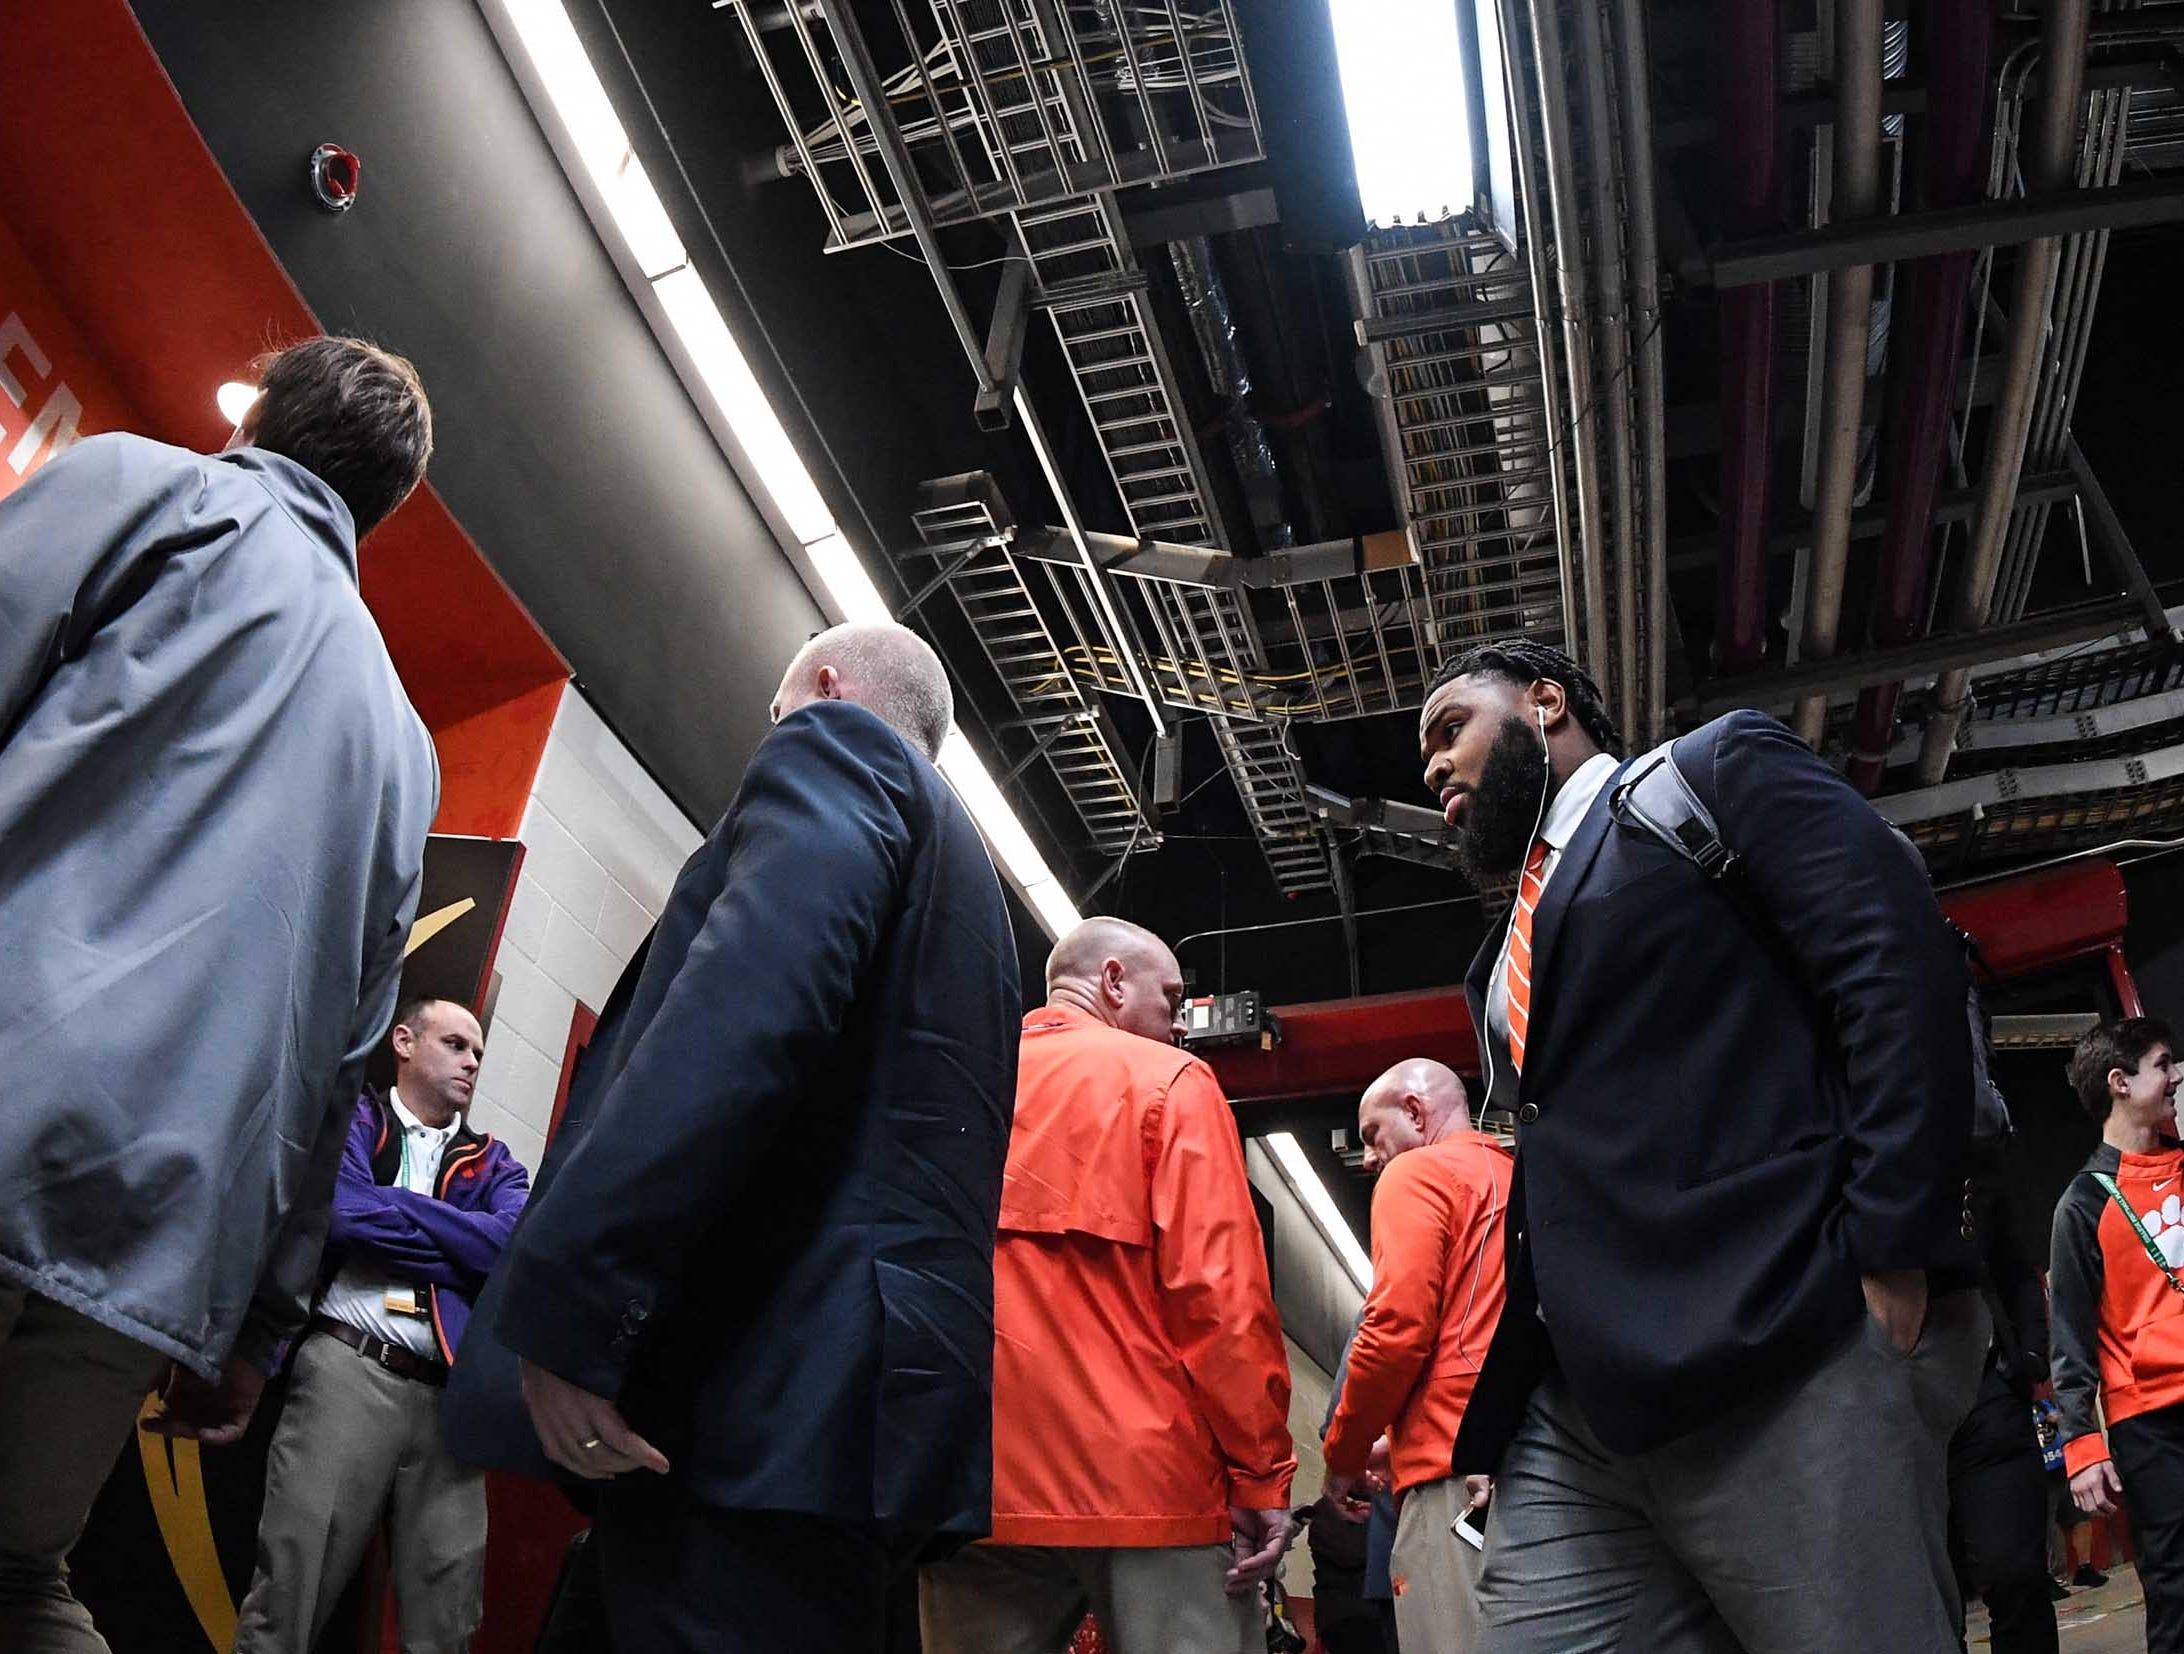 Clemson defensive lineman Christian Wilkins (42) arrives before kickoff at Levi's Stadium in Santa Clara, California Monday, January 7, 2019.